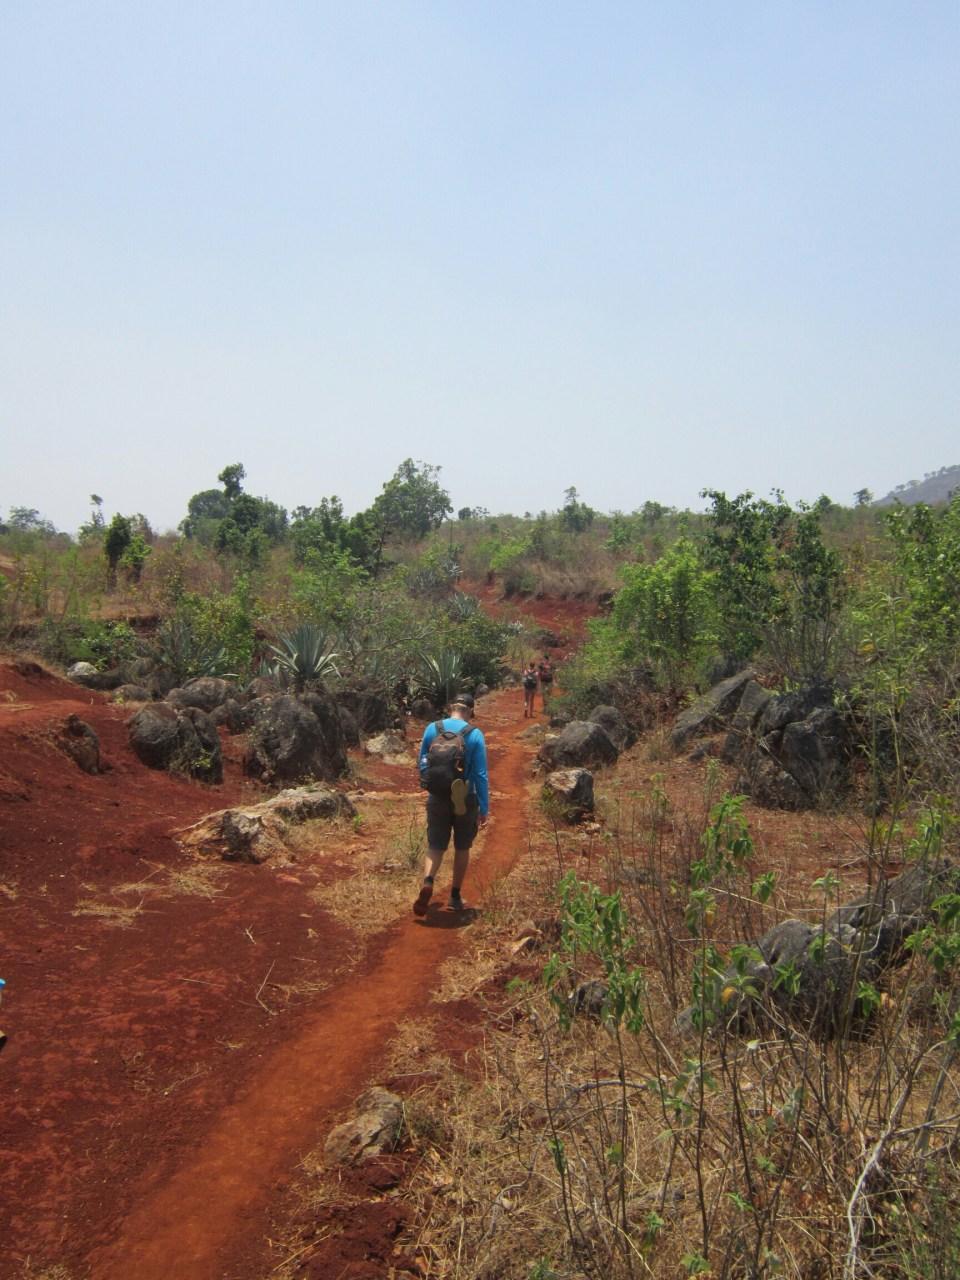 Trekking between Kalaw and Inle Lake, Myanmar